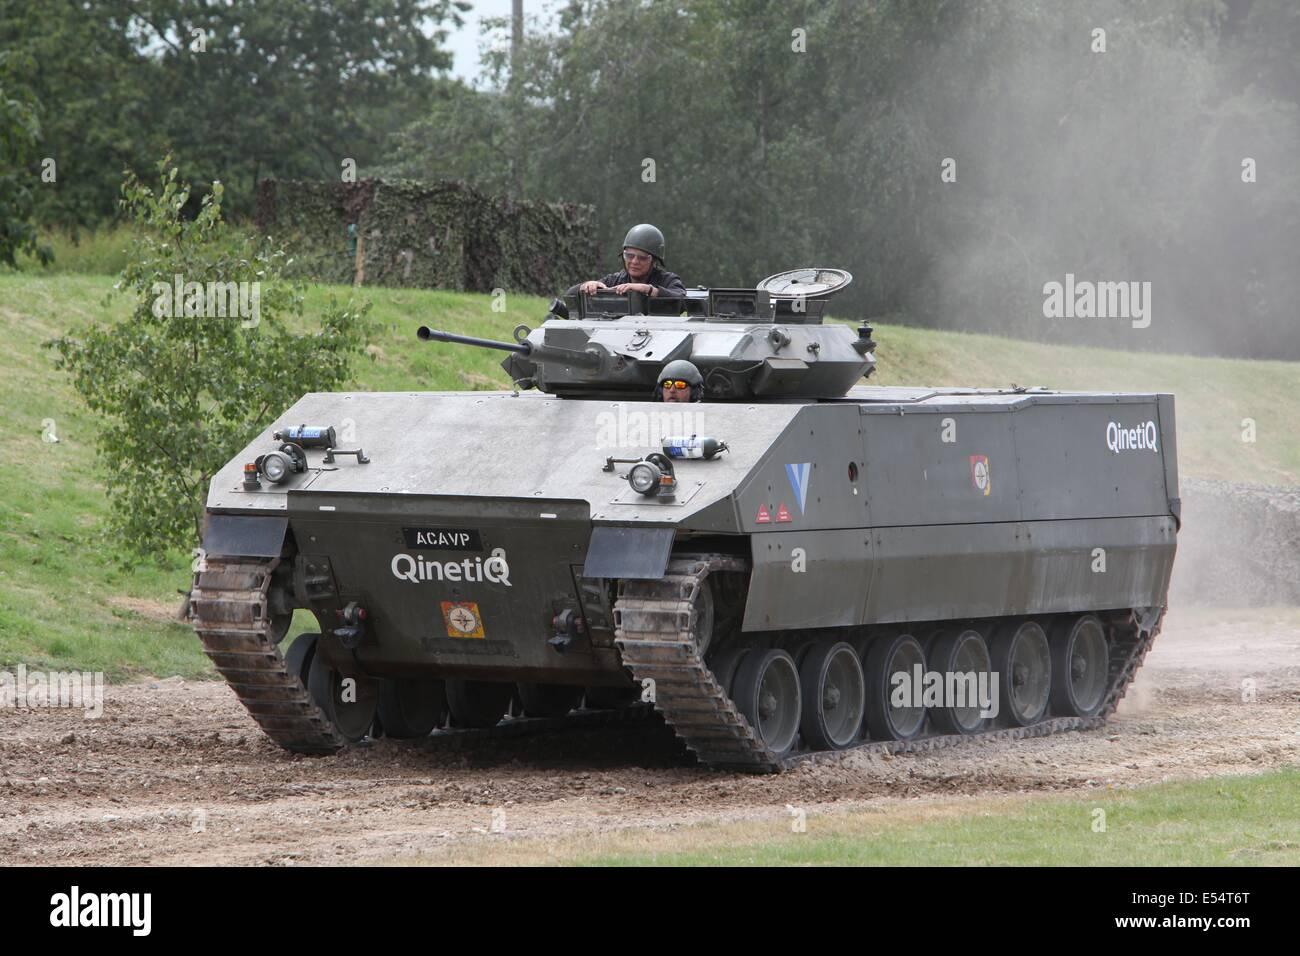 ACAVP QINETIQ Plastic Tank Bovington Tankfest 2014 - Stock Image